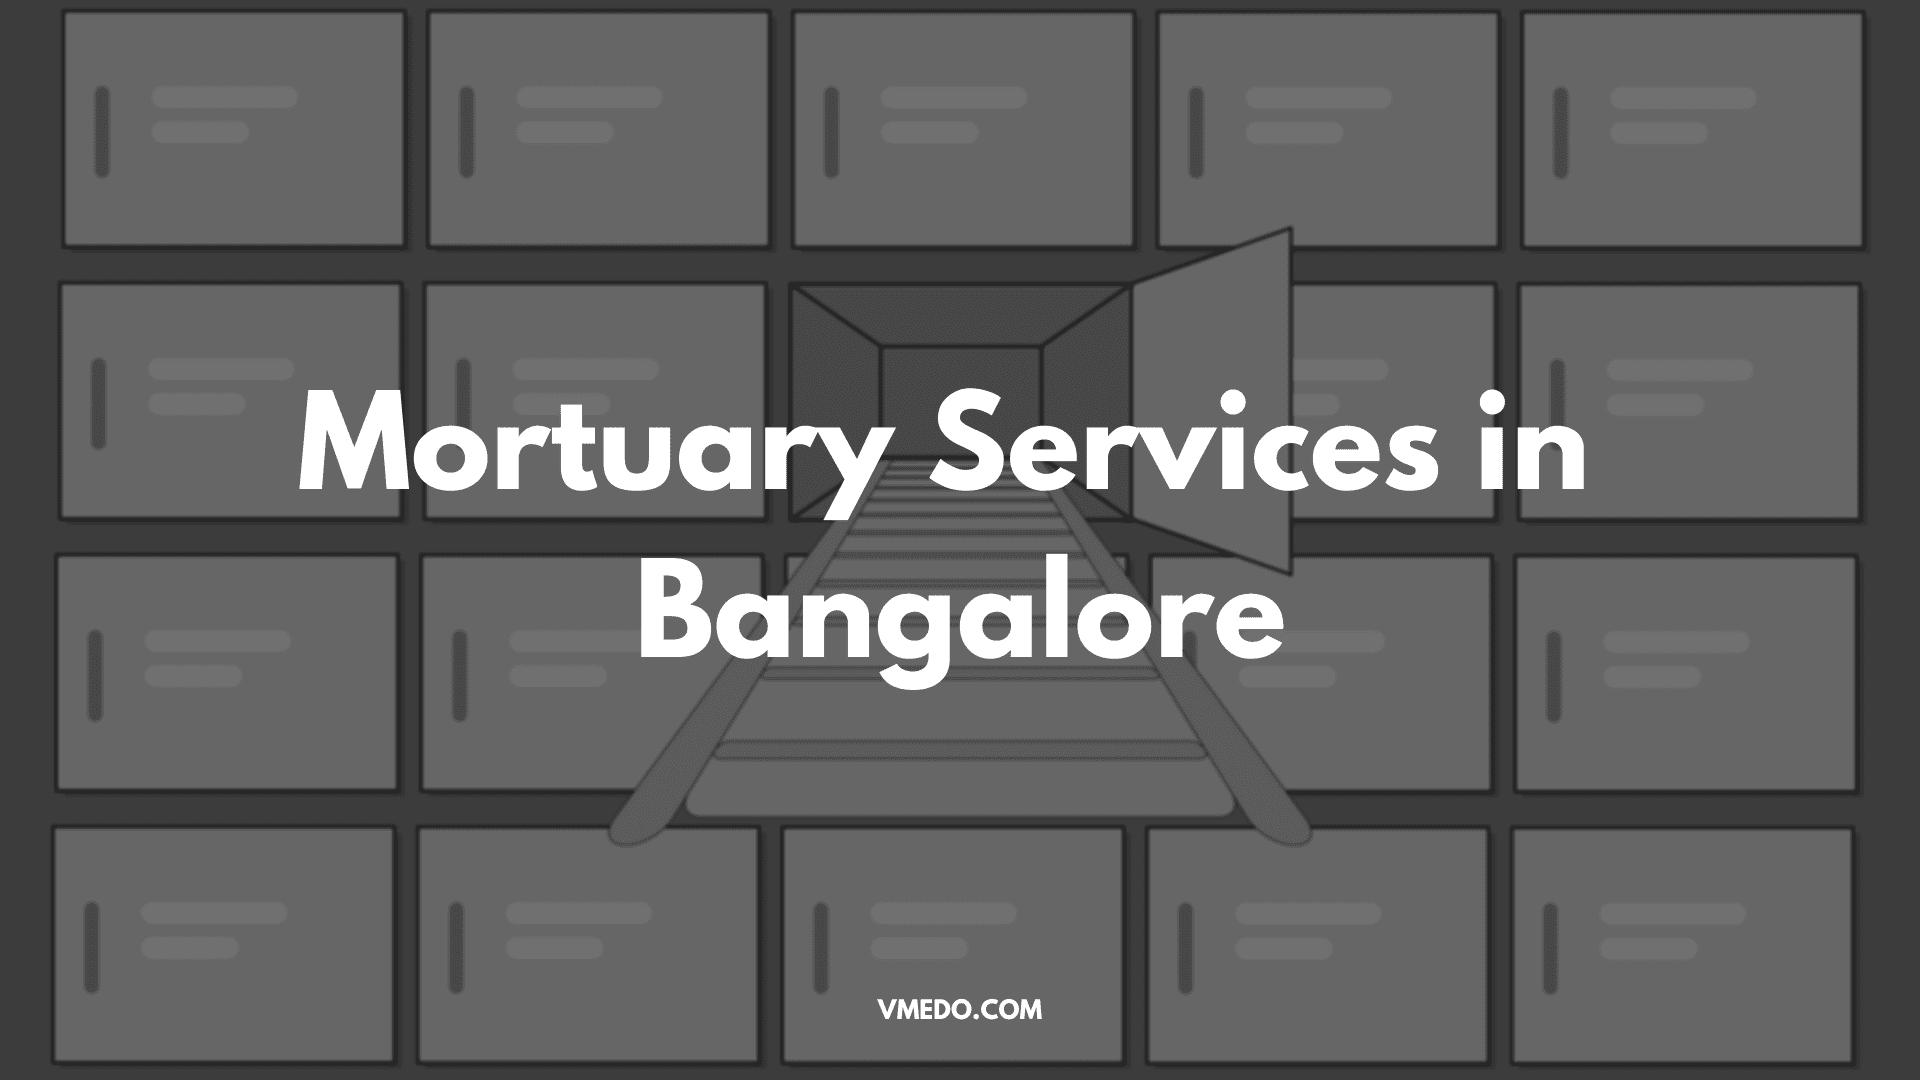 Mortuary Services in Bangalore